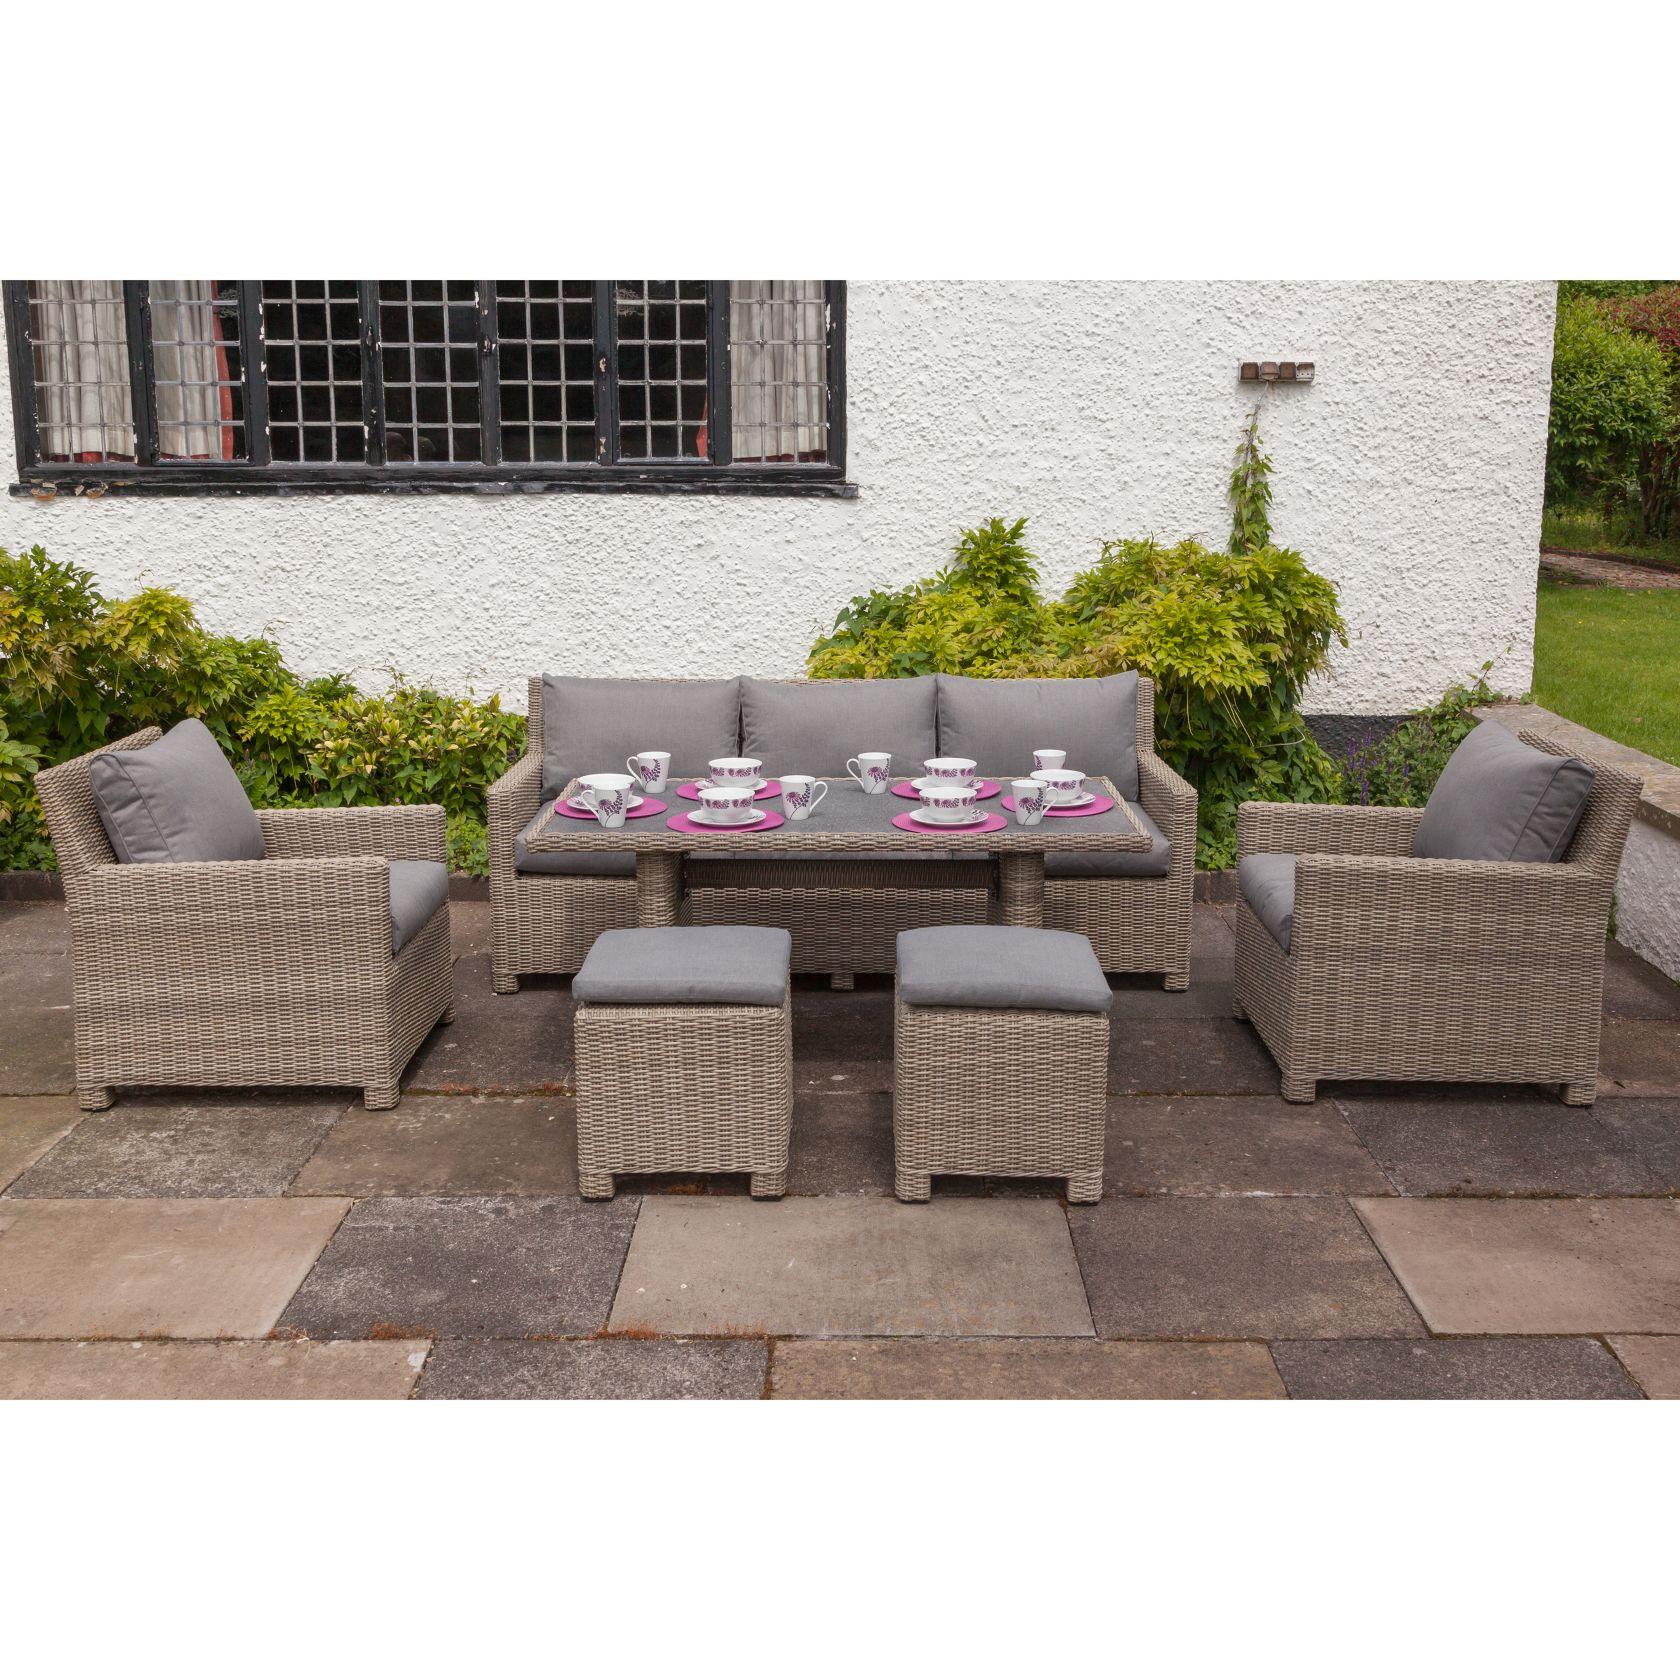 Royalcraft wentworth outdoor furniture